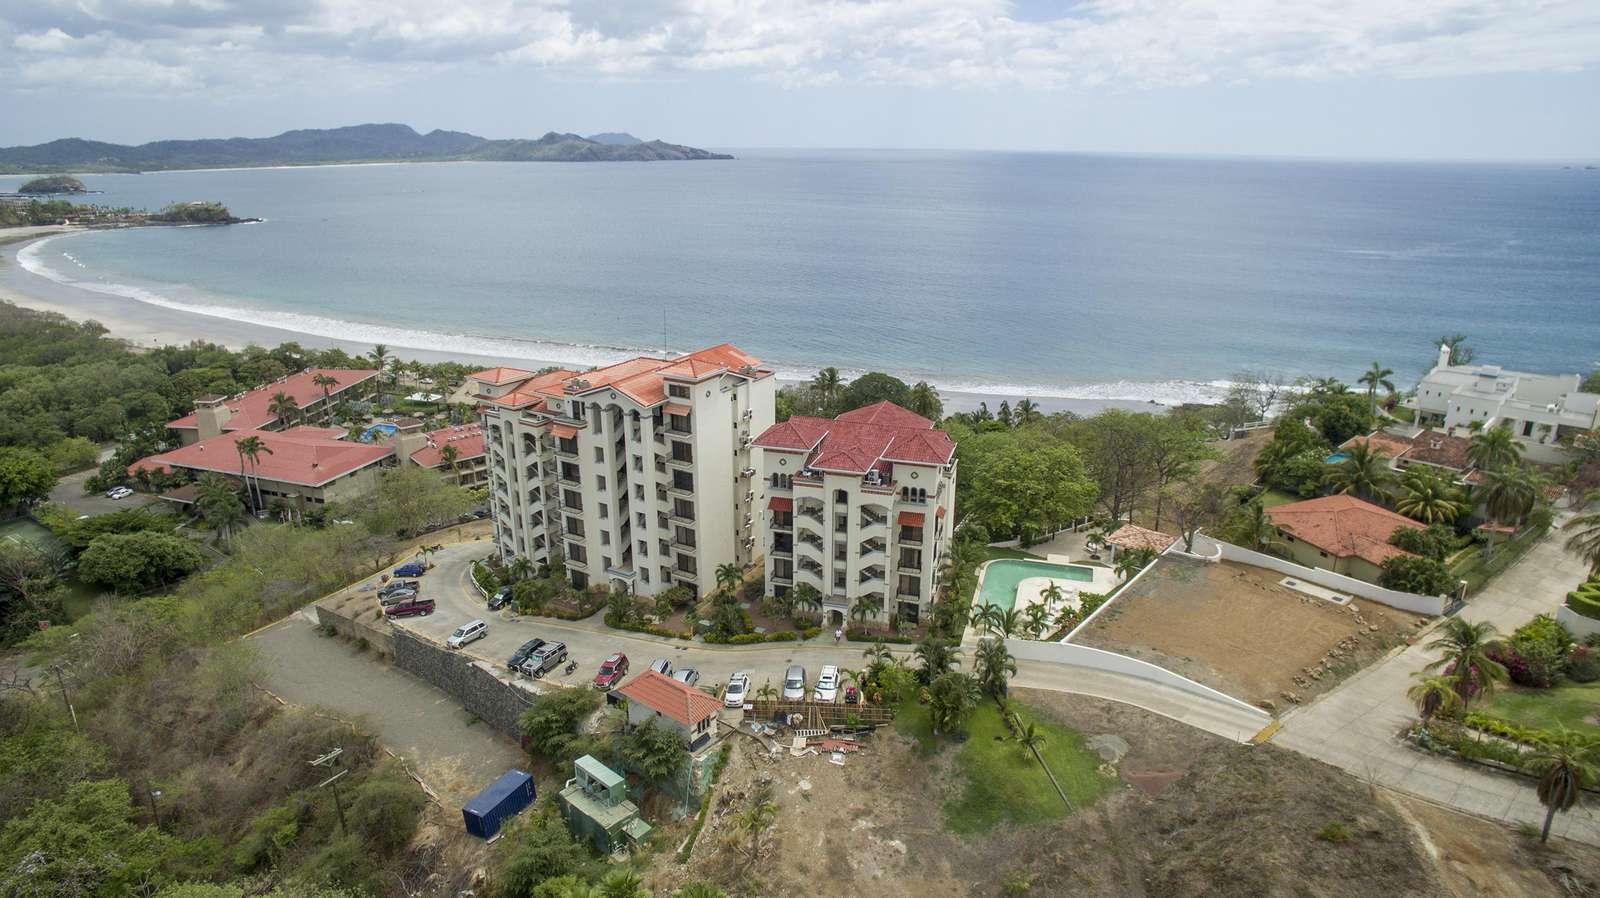 Aerial view of Oceanica and Flamingo Beach